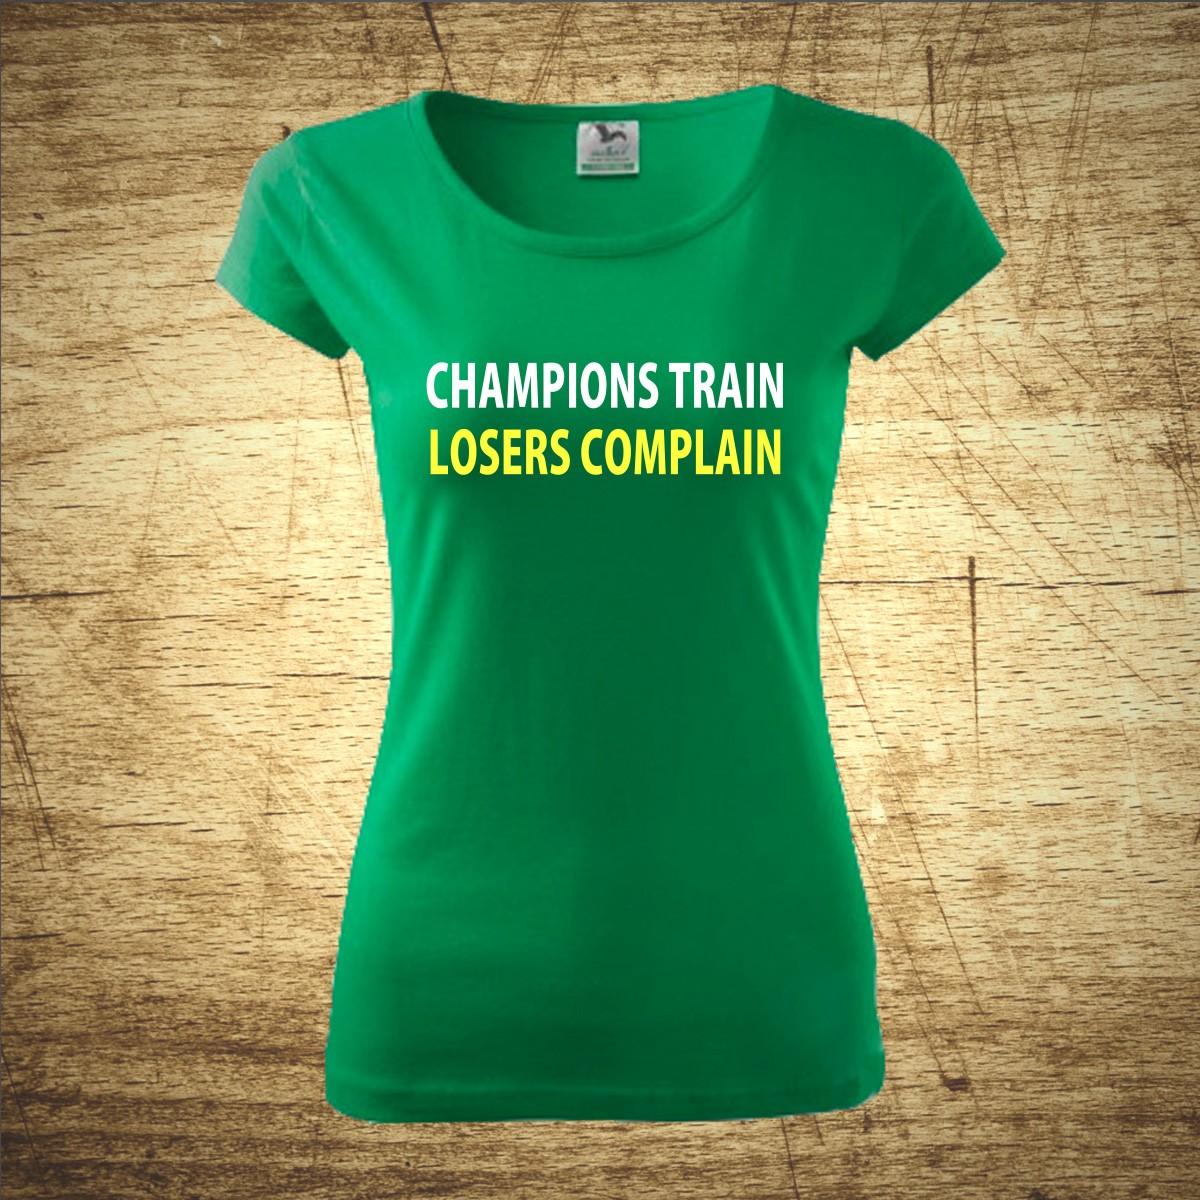 Motivational Quotes For Sports Teams: Tričko S Motivem Champions Train, Losers Complain